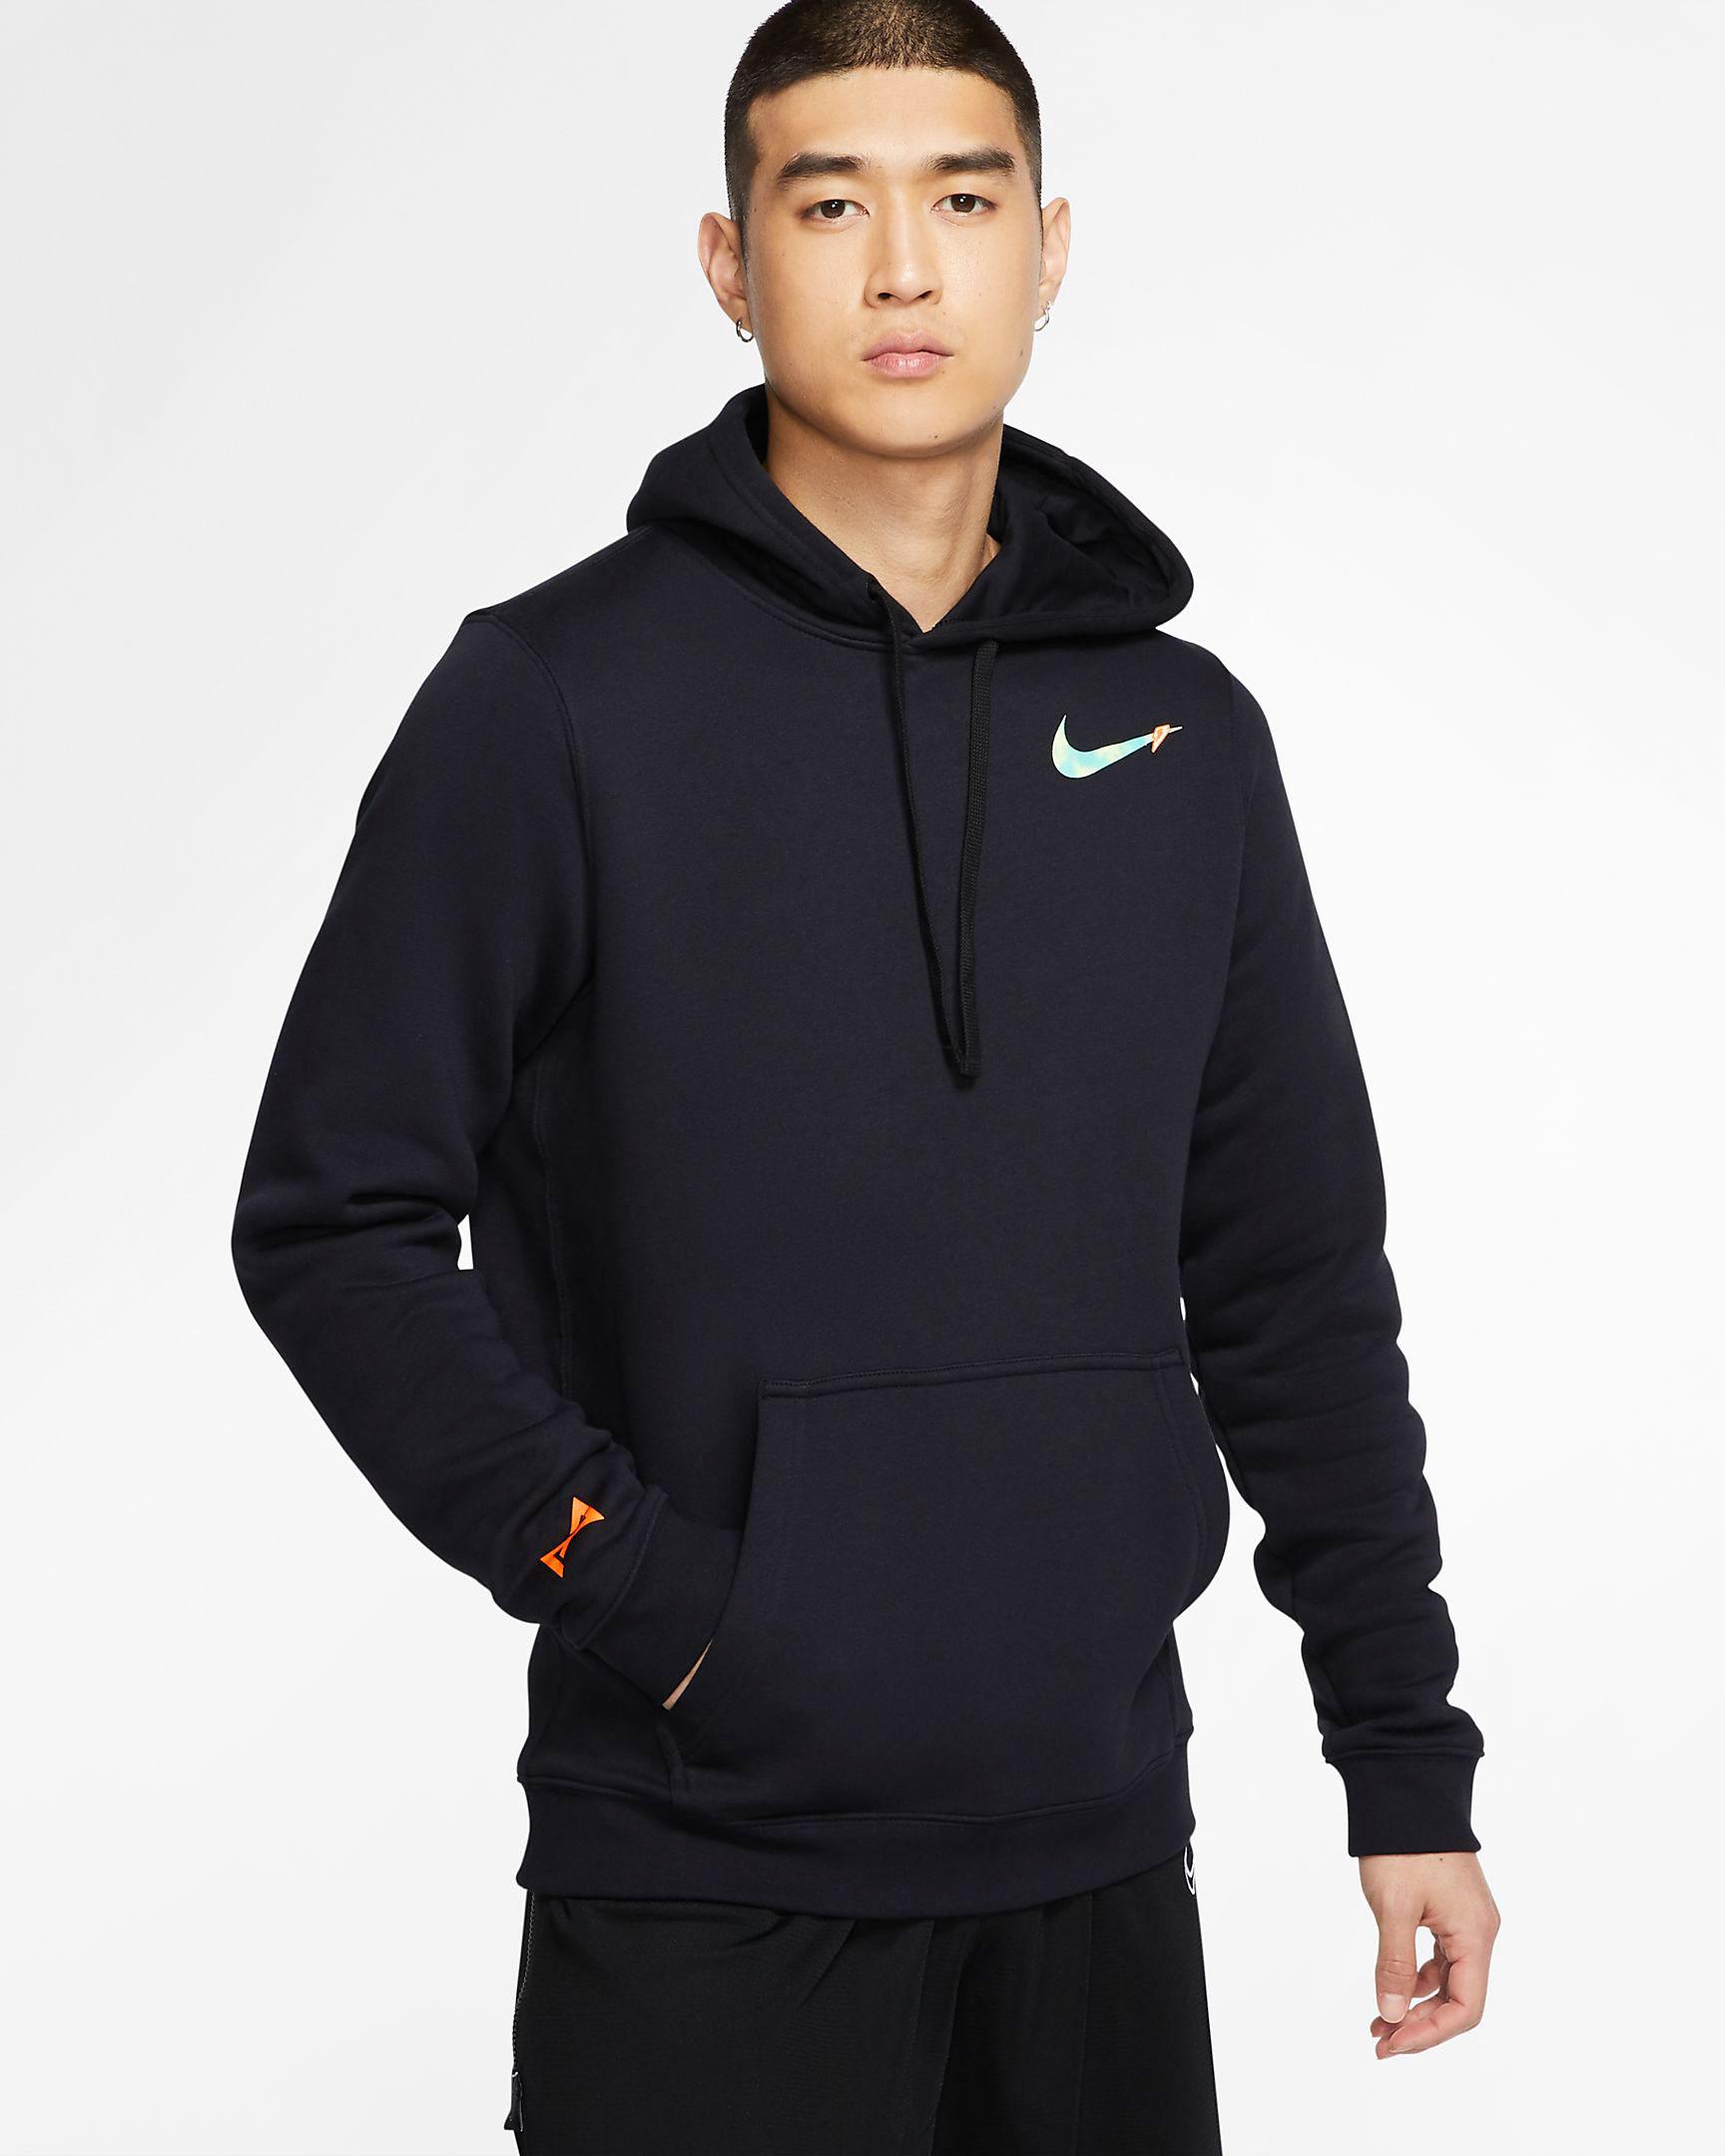 nike-pg-4-gatorade-all-star-hoodie-3